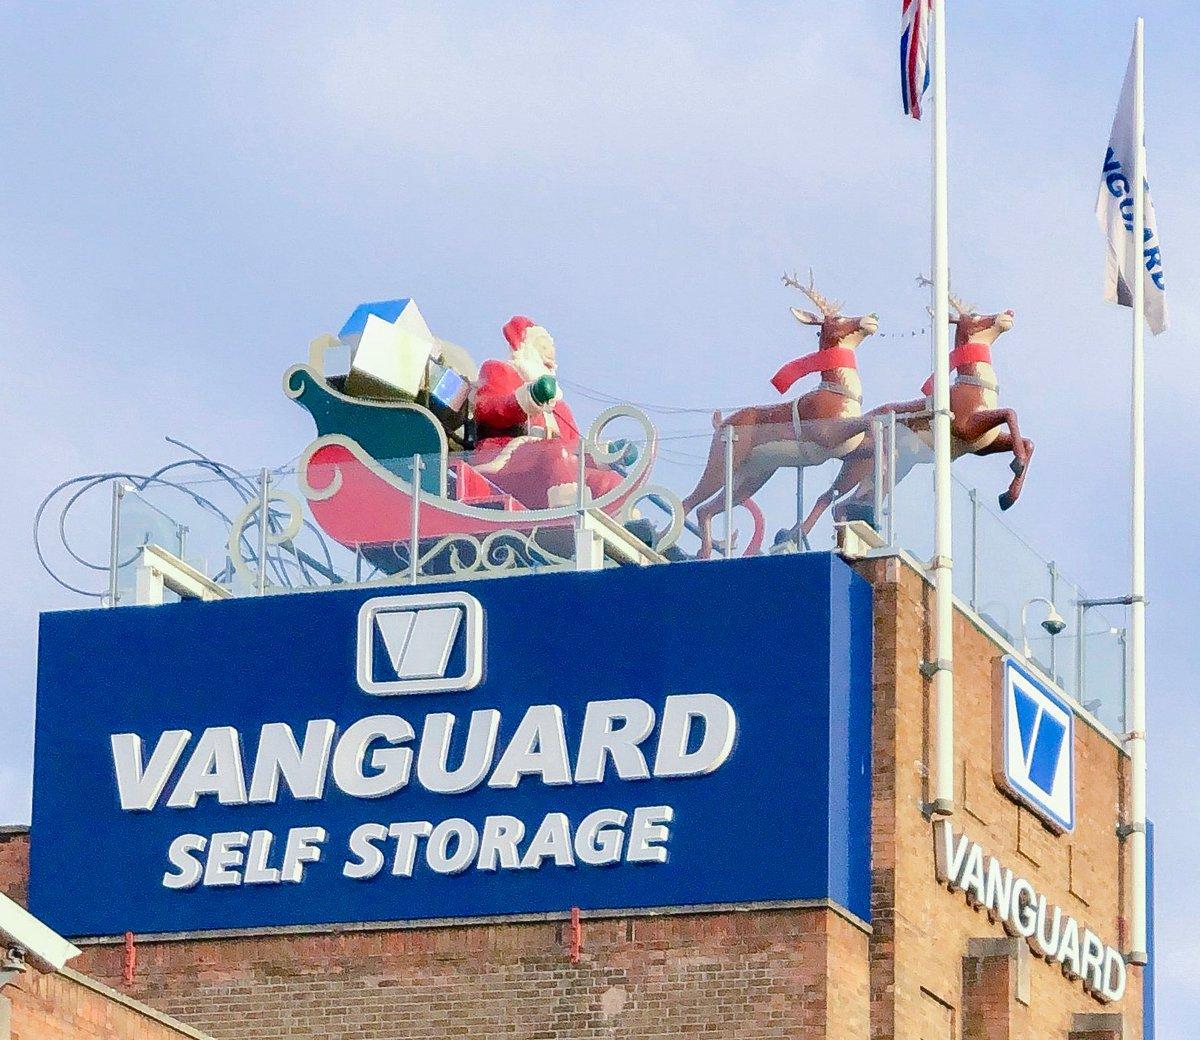 Exceptionnel Vanguard Storage (@VanguardStorage) | Twitter